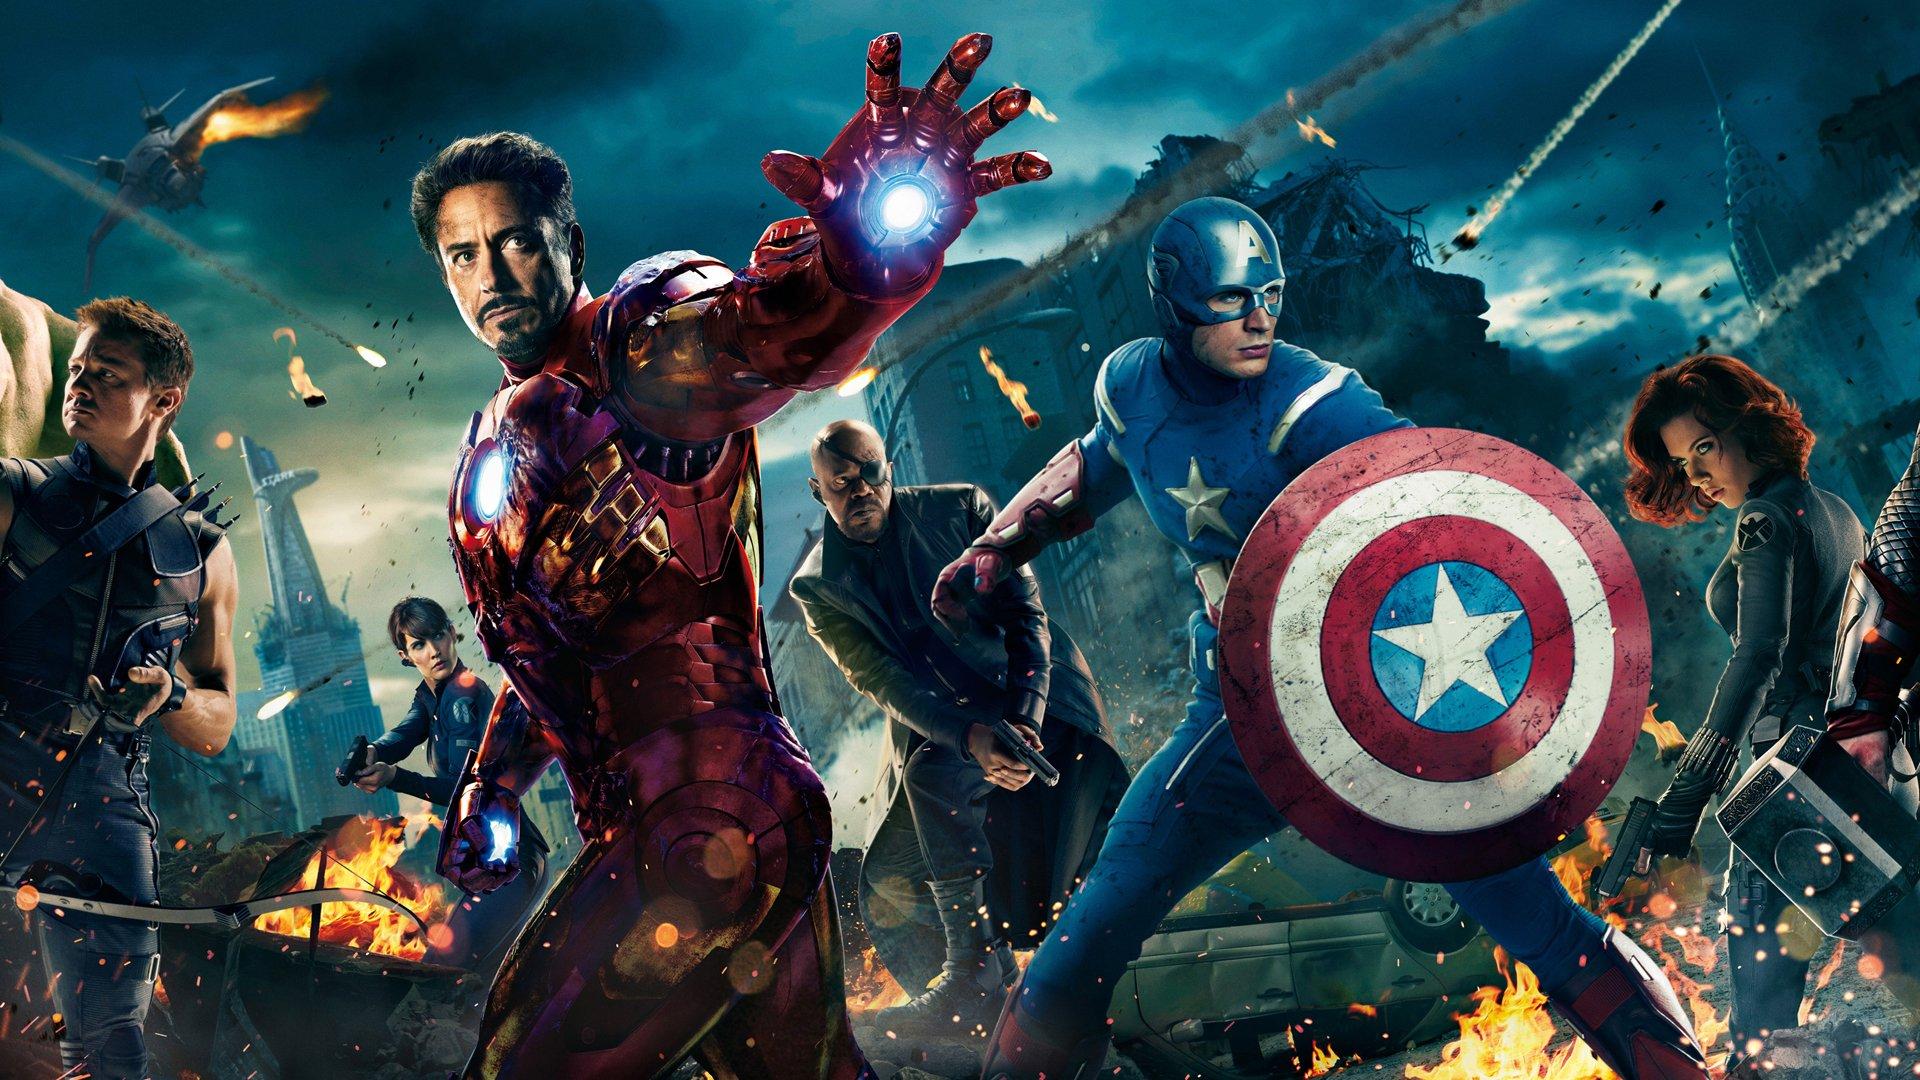 Avengers Wallpaper: Avengers HD Wallpapers 1080p